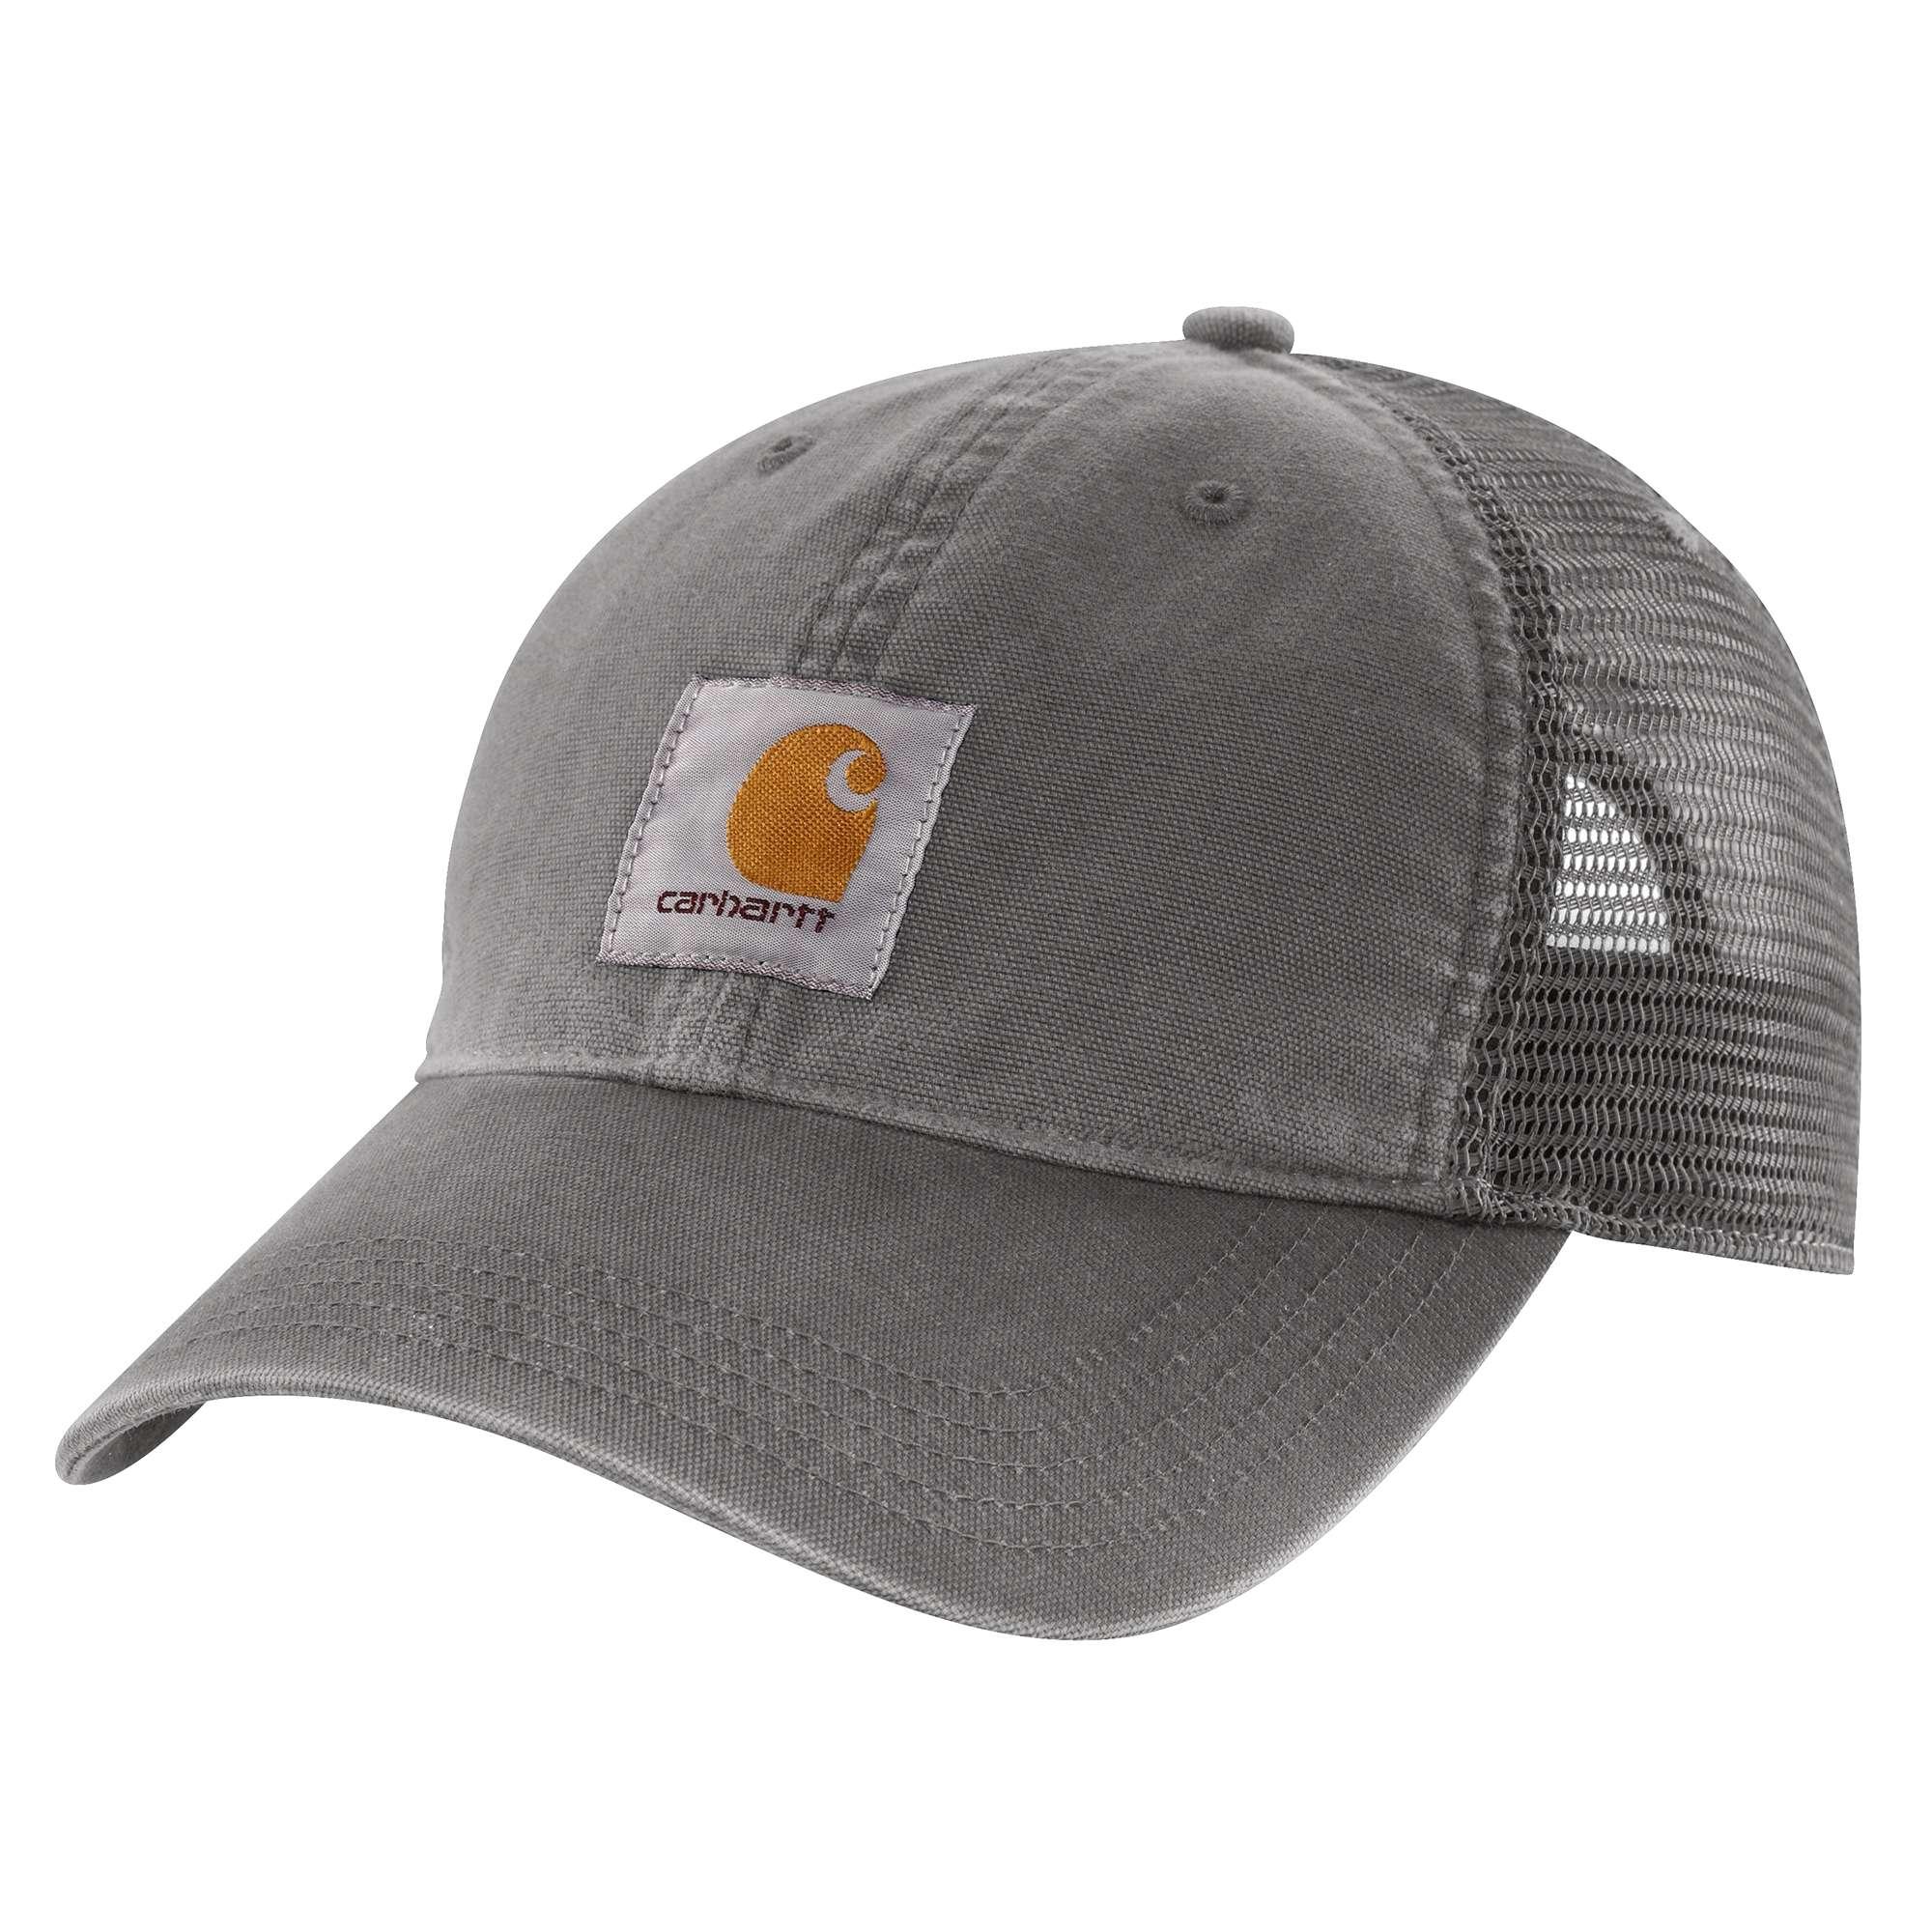 M Cotton Canvas Cap, Gray, swatch